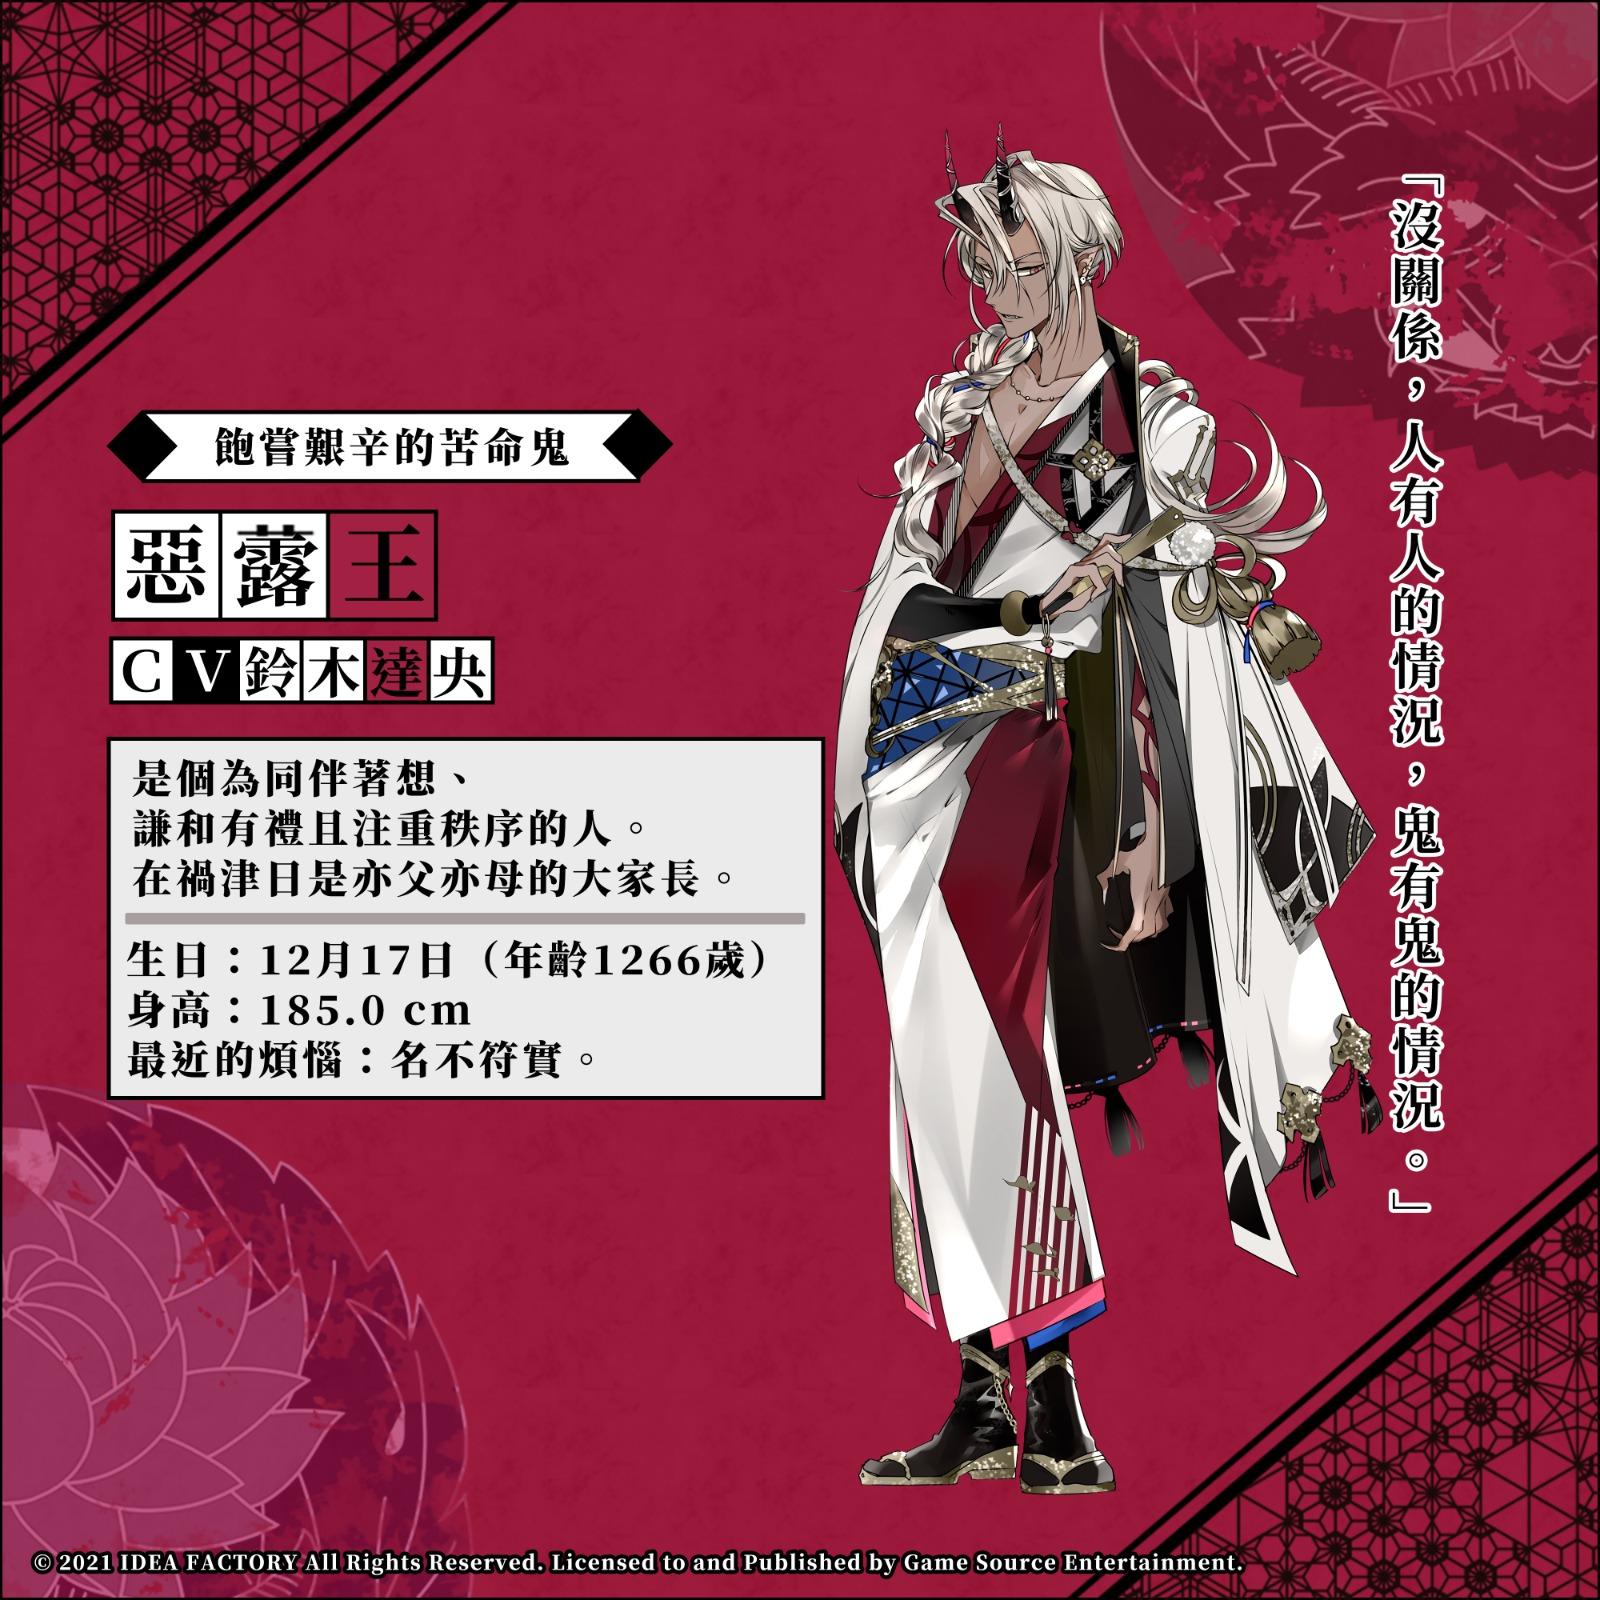 第六妖守, Dairoku Ayakashimori, 惡虂王, 鈴木達央, Game Source Entertainment, GSE,